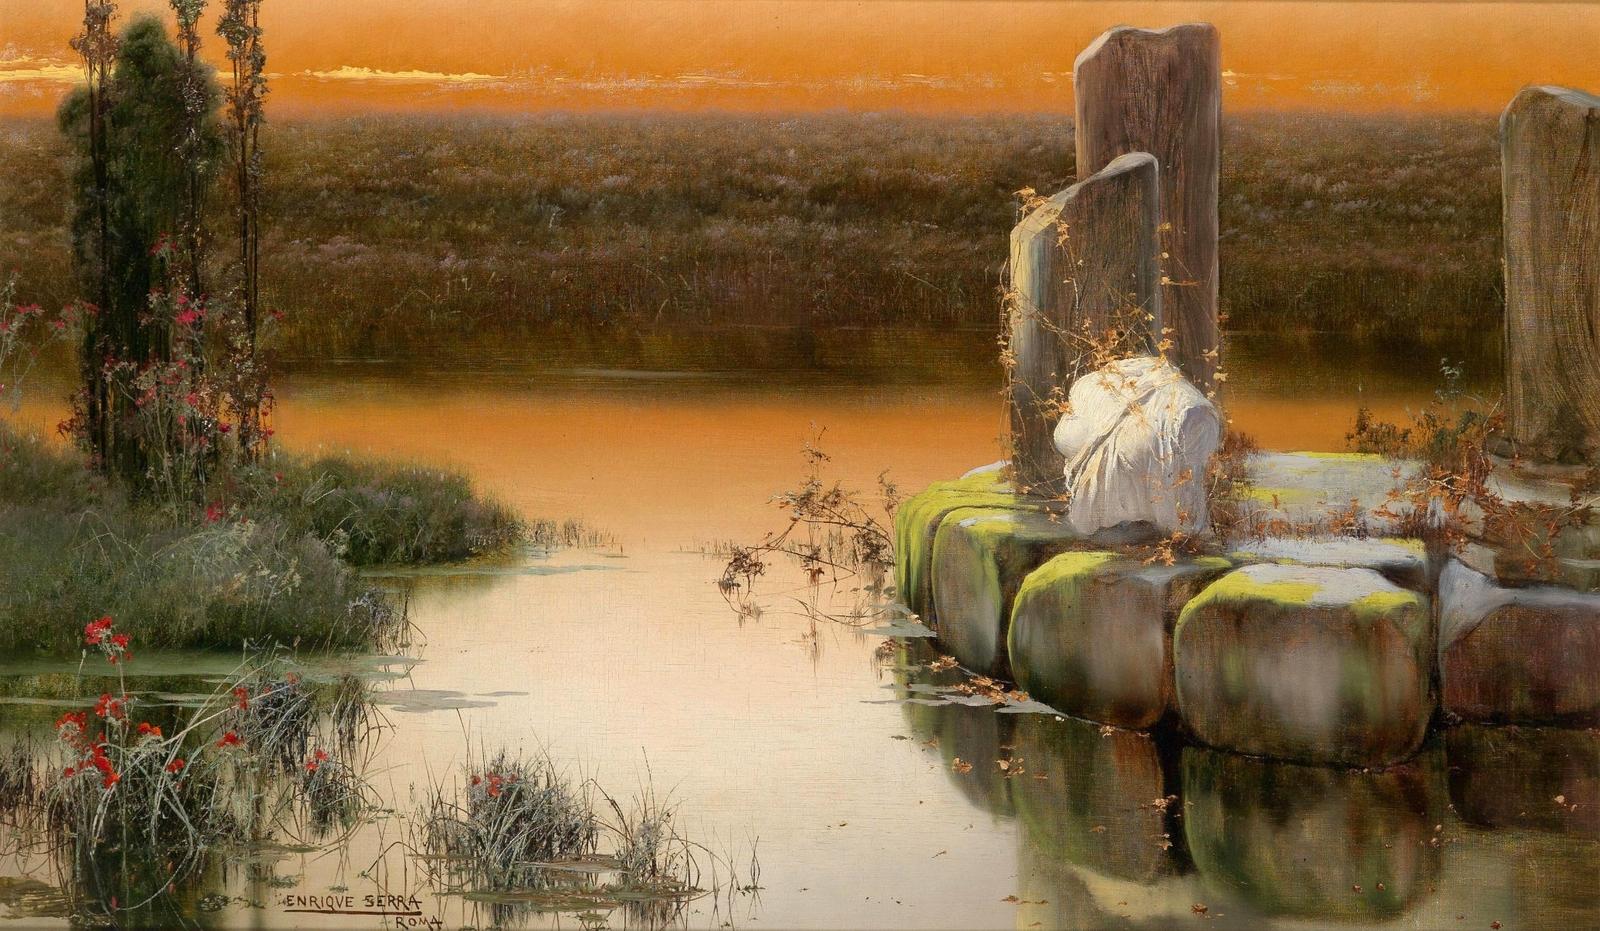 Enrique  Serra  y  Auque  In  the  Pontine  marshes